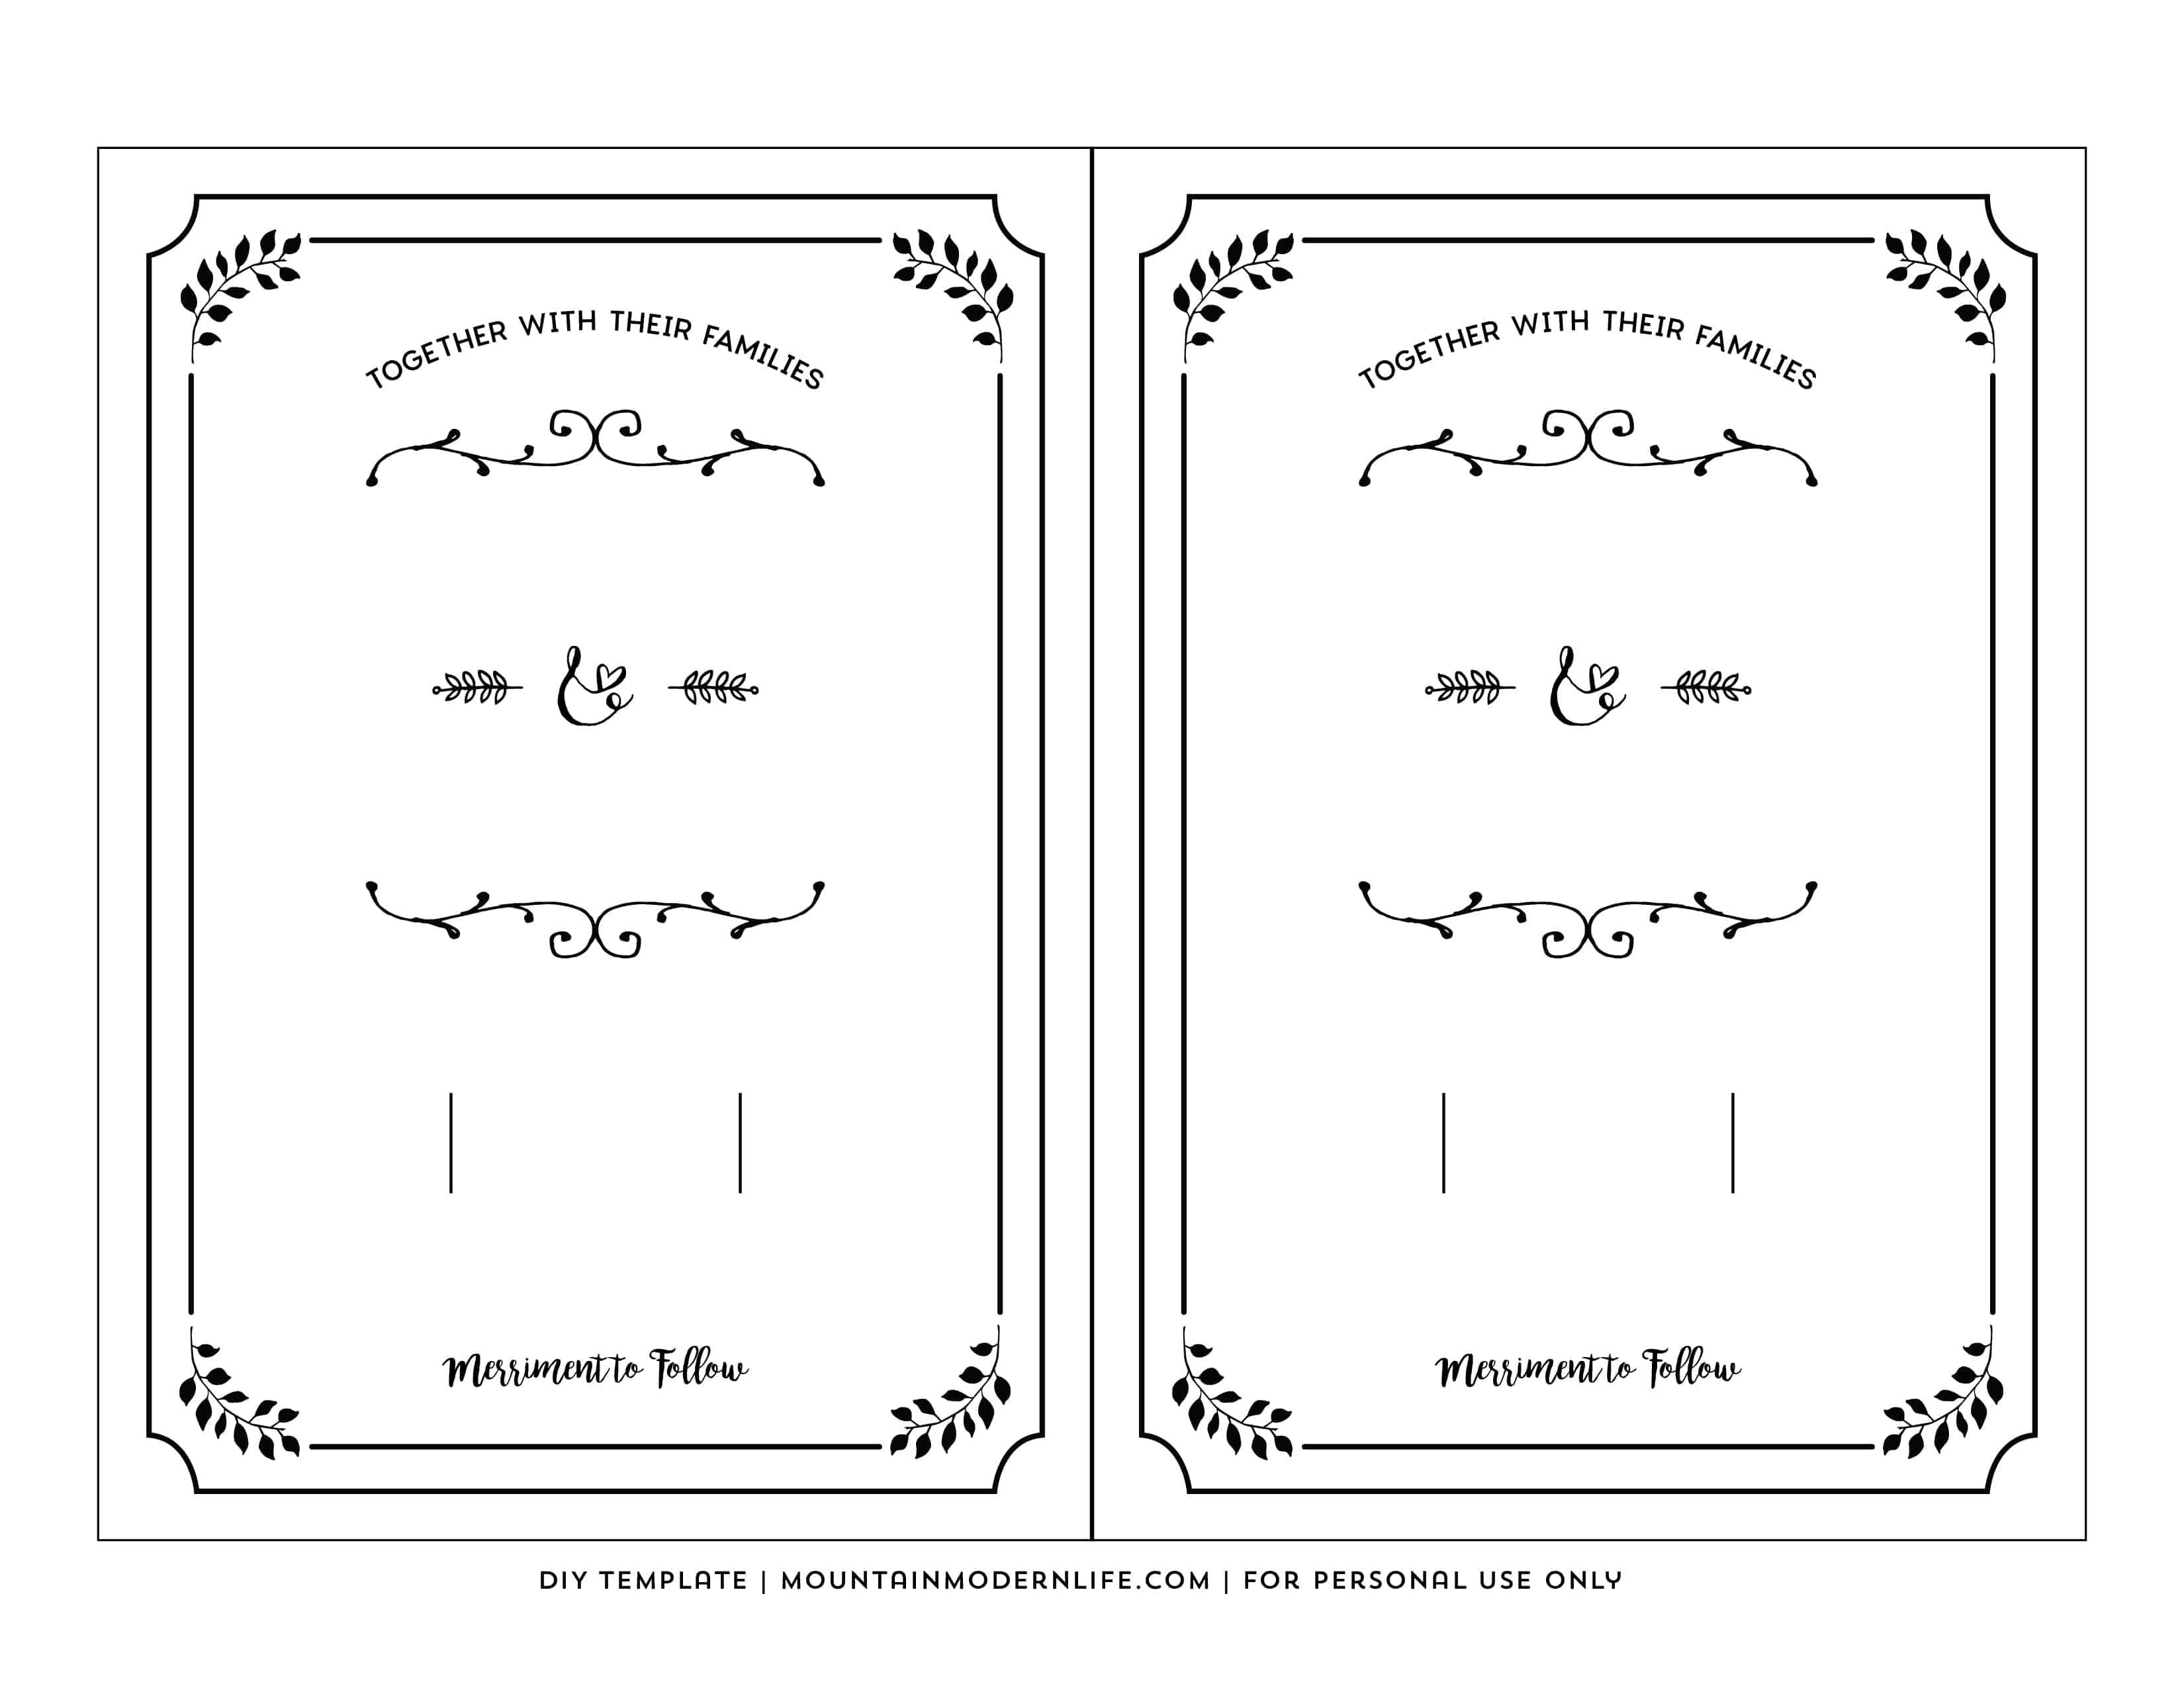 Free Printable Wedding Invitation Template - Free Printable Invitations Templates